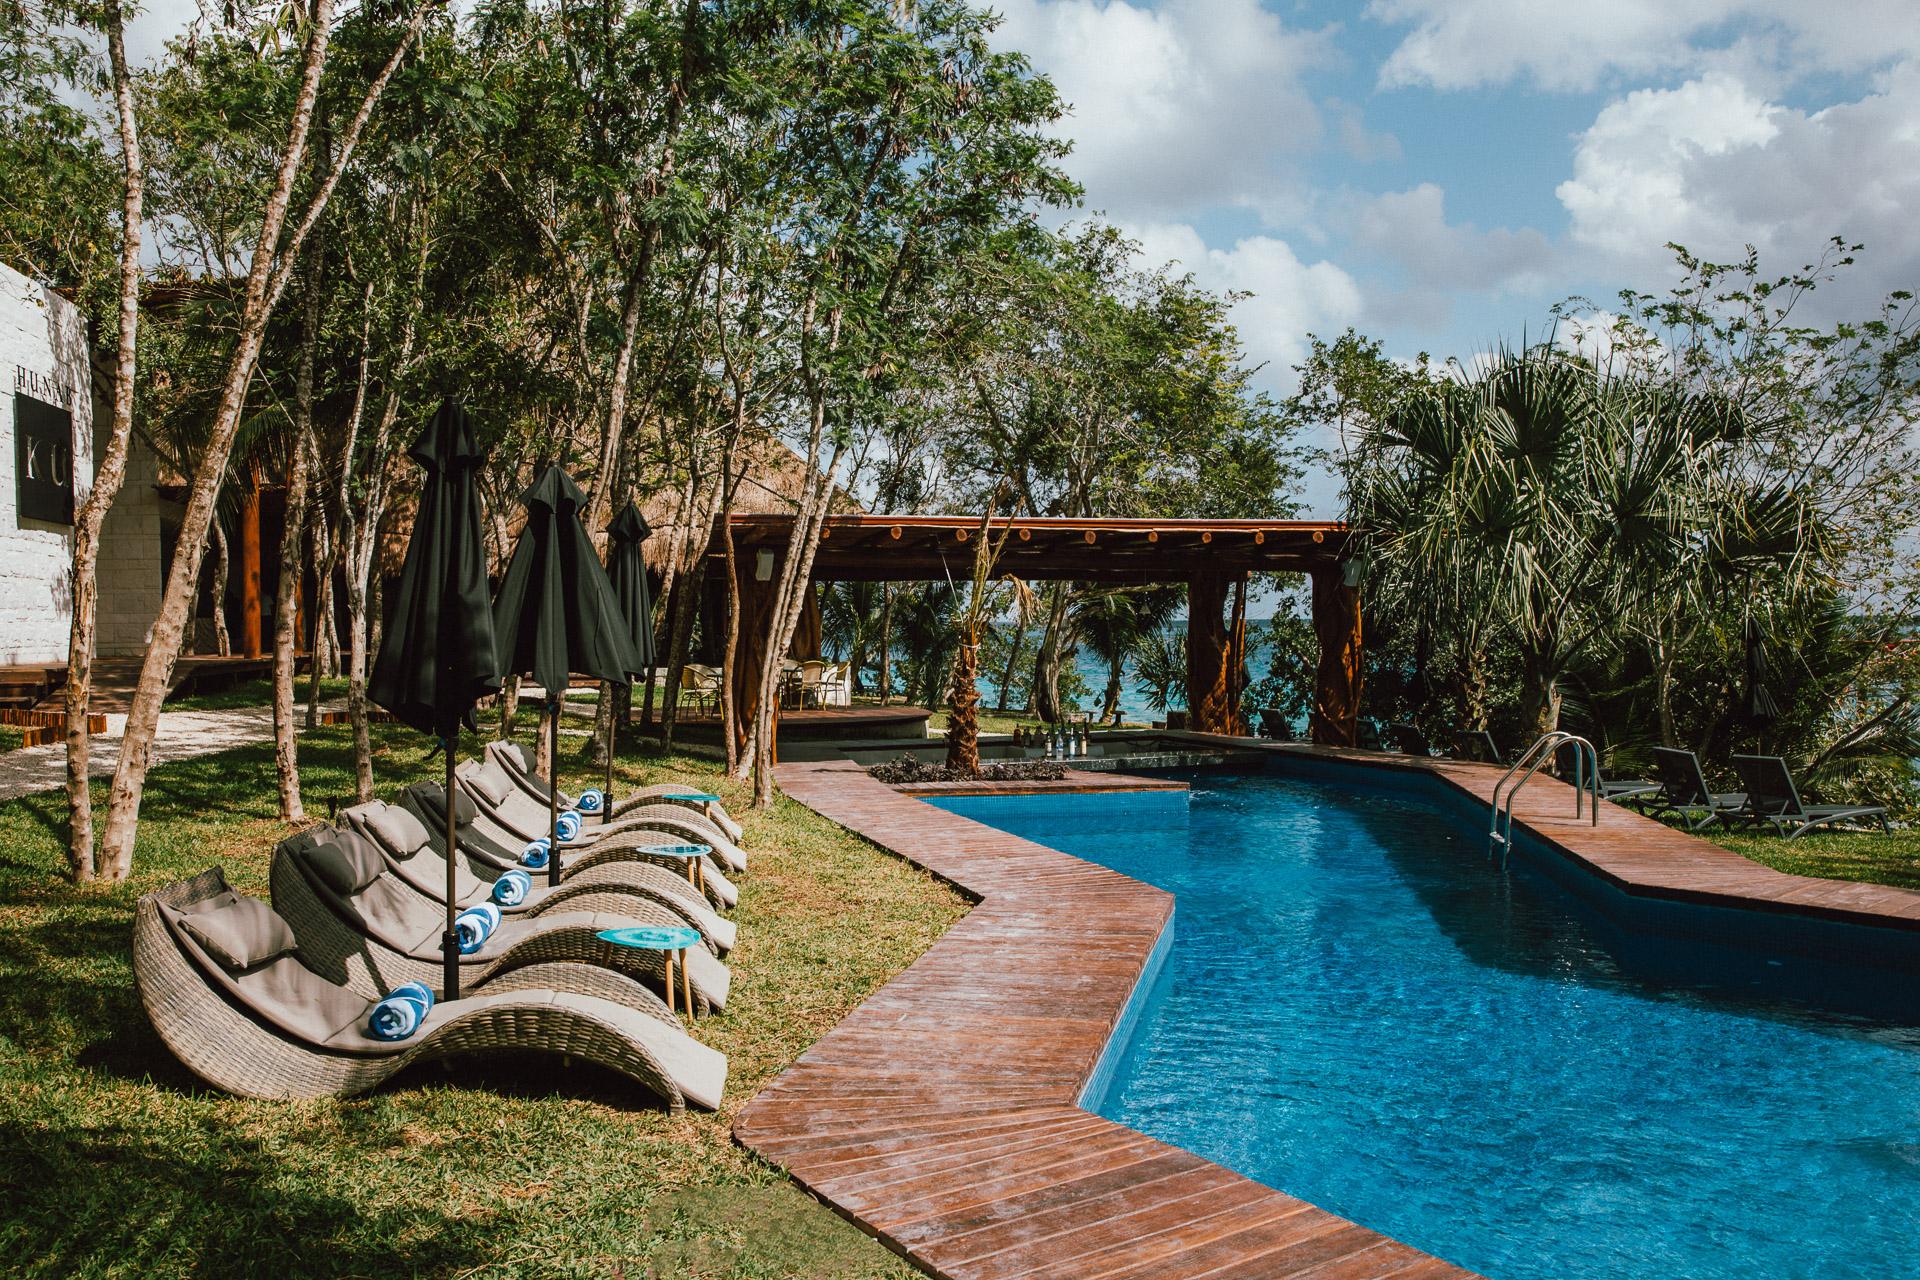 mexico-luxury-hotel-photographer-riviera-maya-mia-bacalar-17.jpg